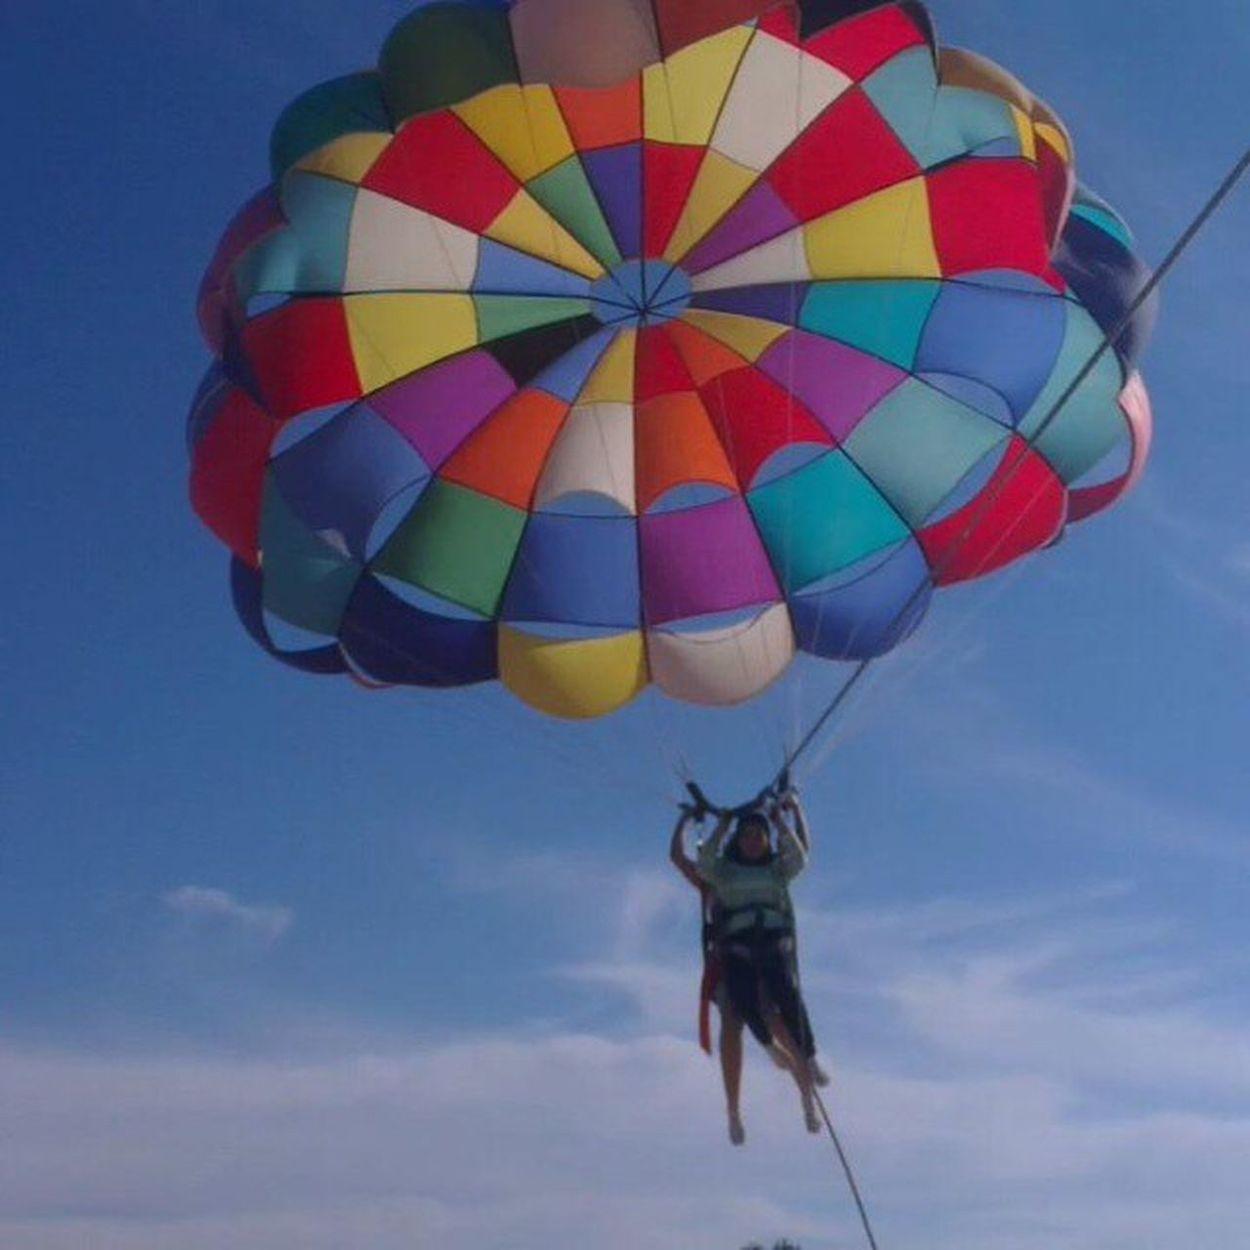 Parasailing Parachutte Nofilter